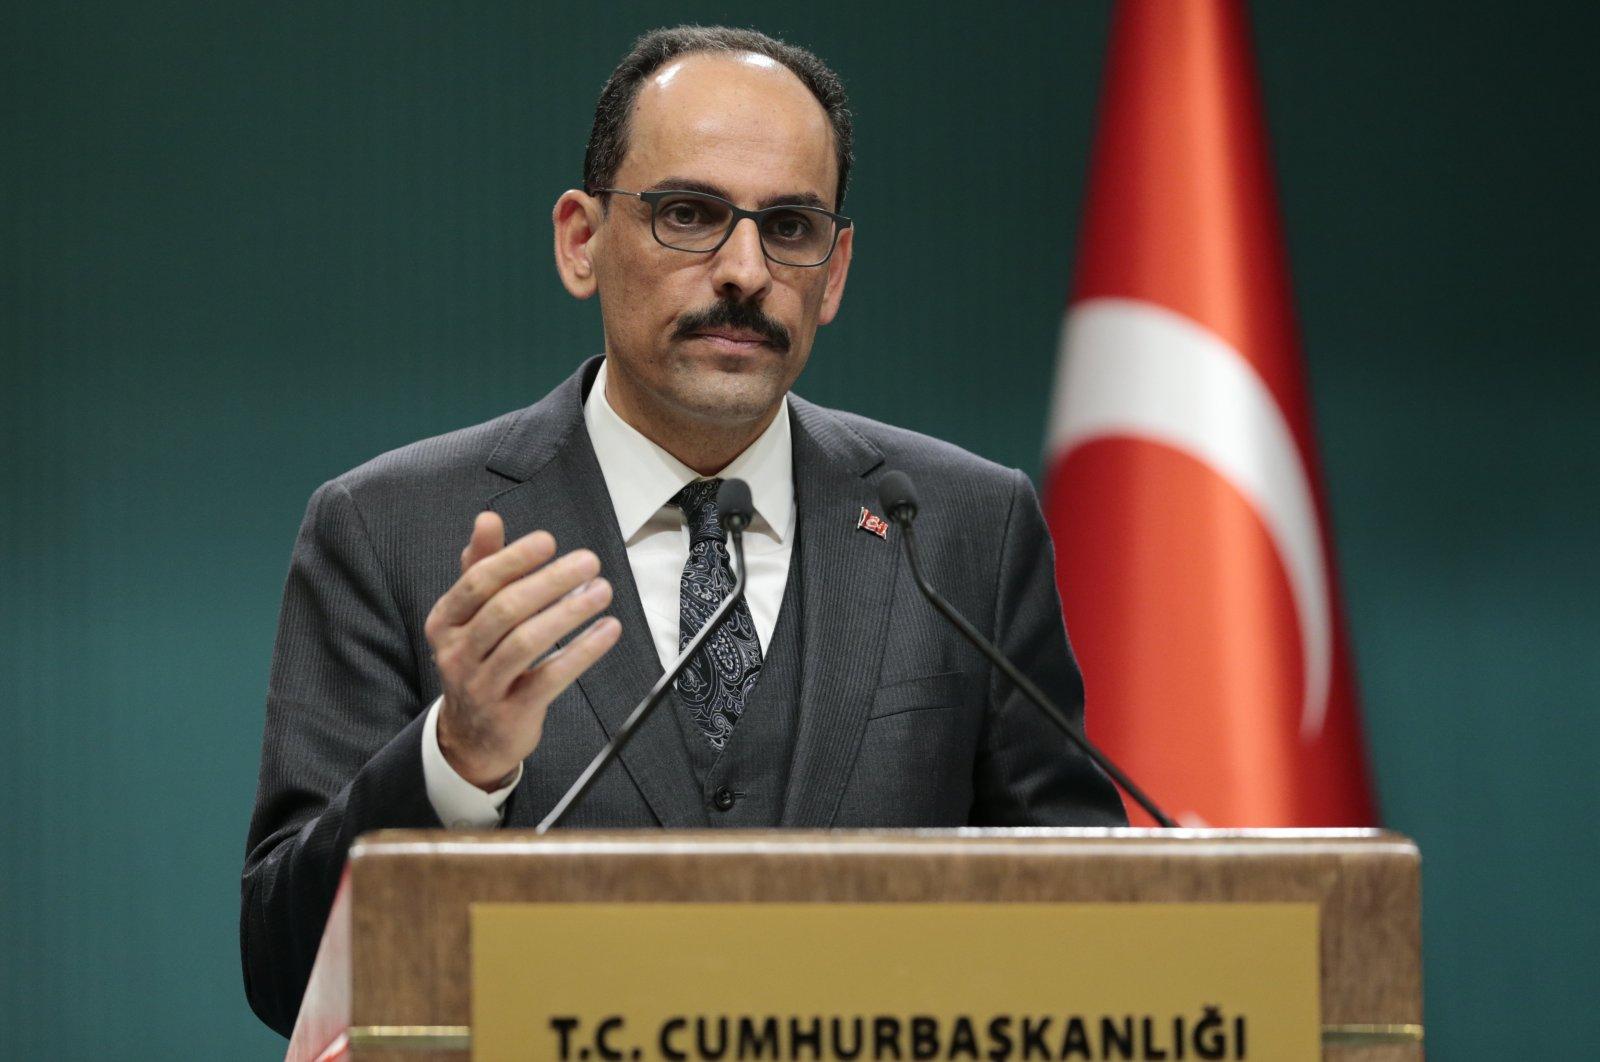 Presidential spokesman İbrahim Kalın speaks during a news conference, Ankara, Turkey, March 12, 2020. (AA Photo)